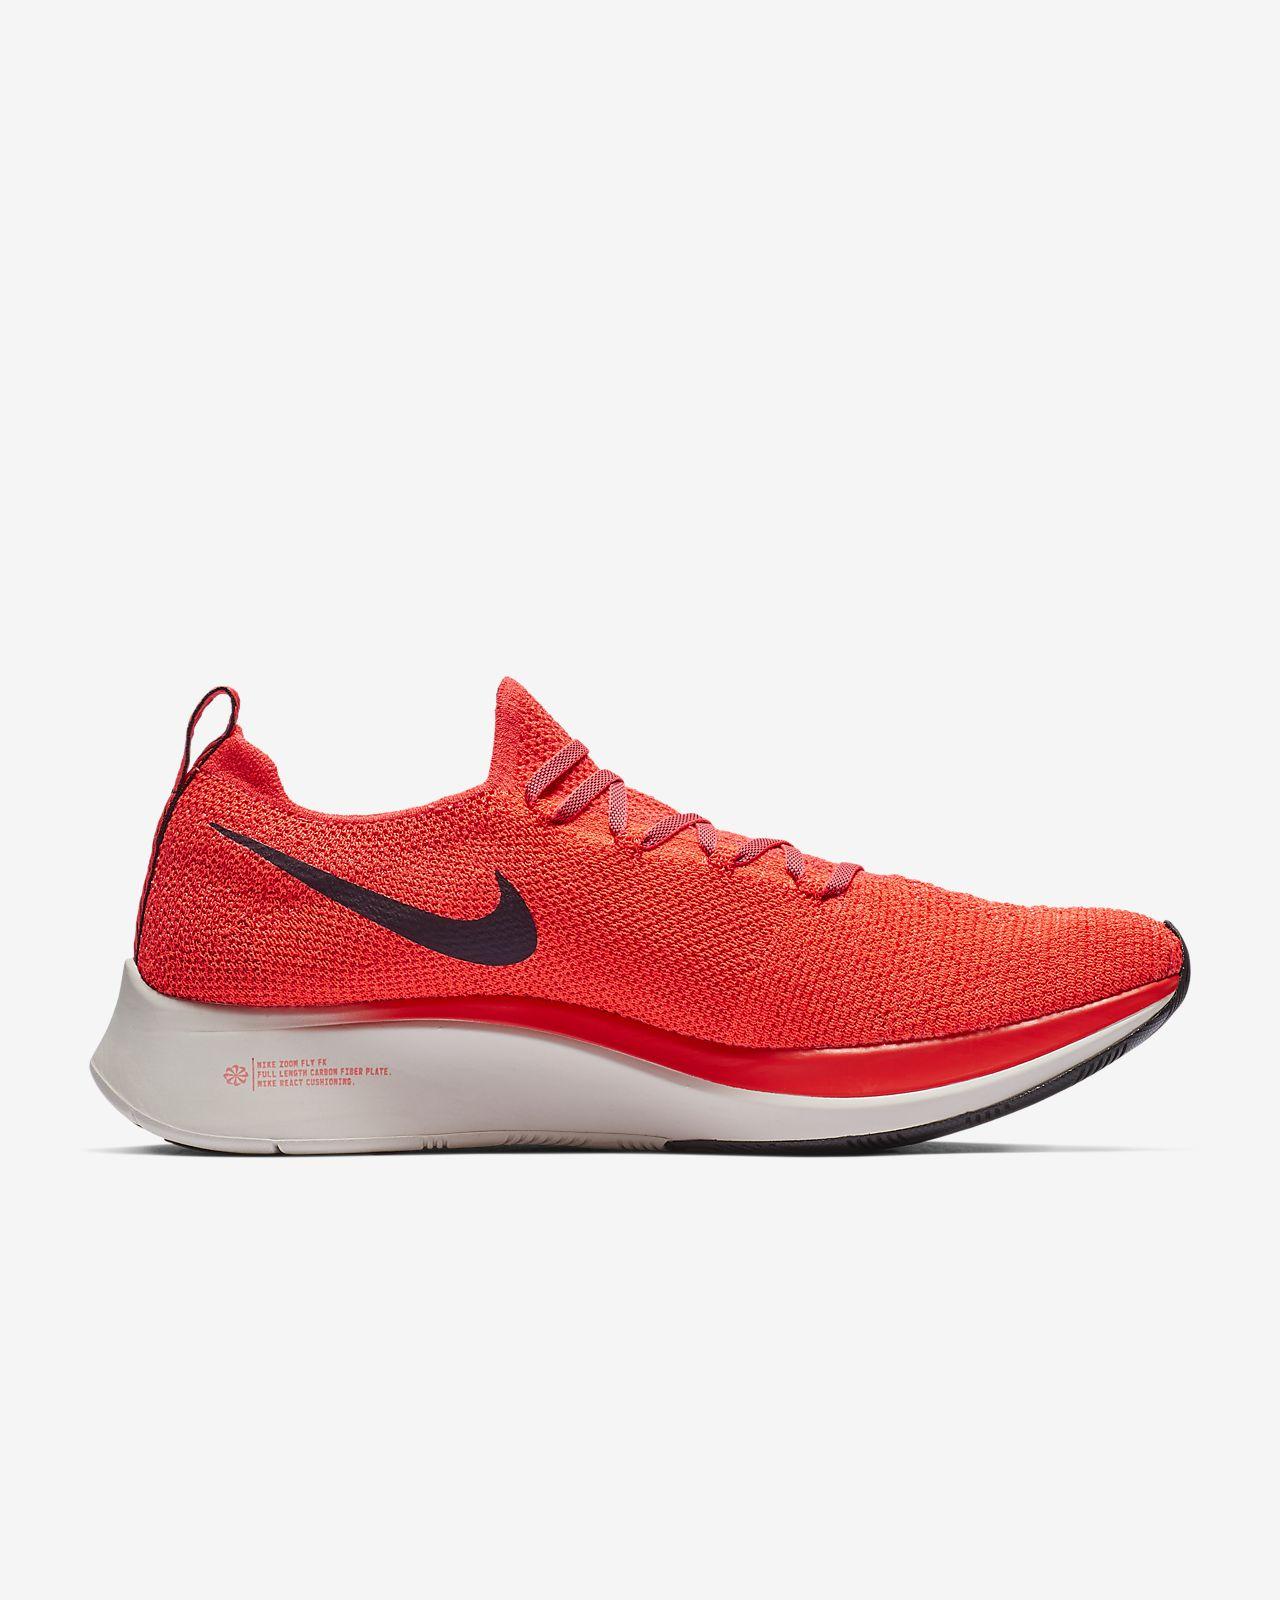 31430a60e161 Nike Zoom Fly Flyknit Men s Running Shoe. Nike.com BE